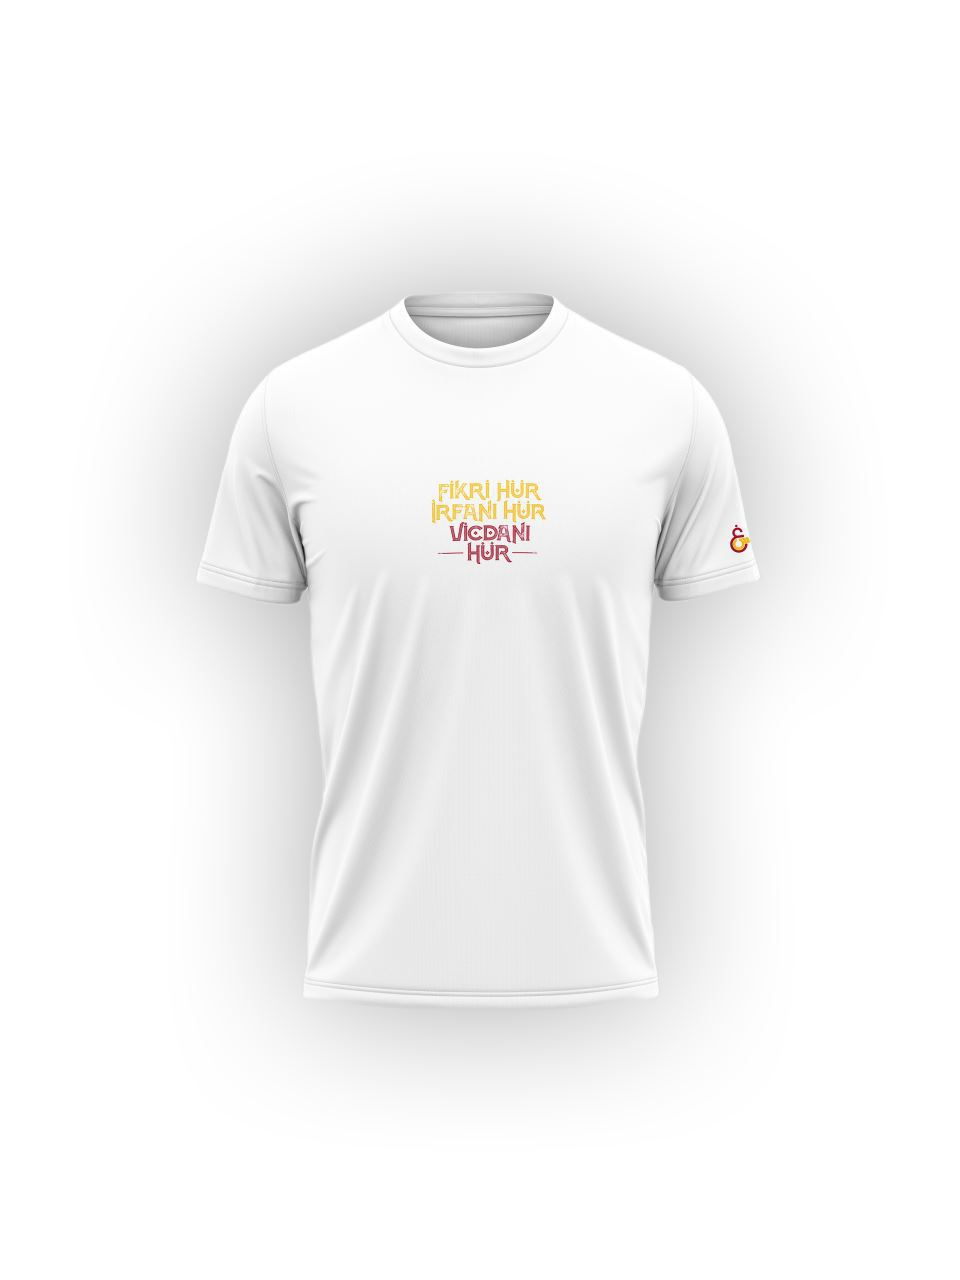 Galatasaray Fikri Hür Erkek T-shirt E211701